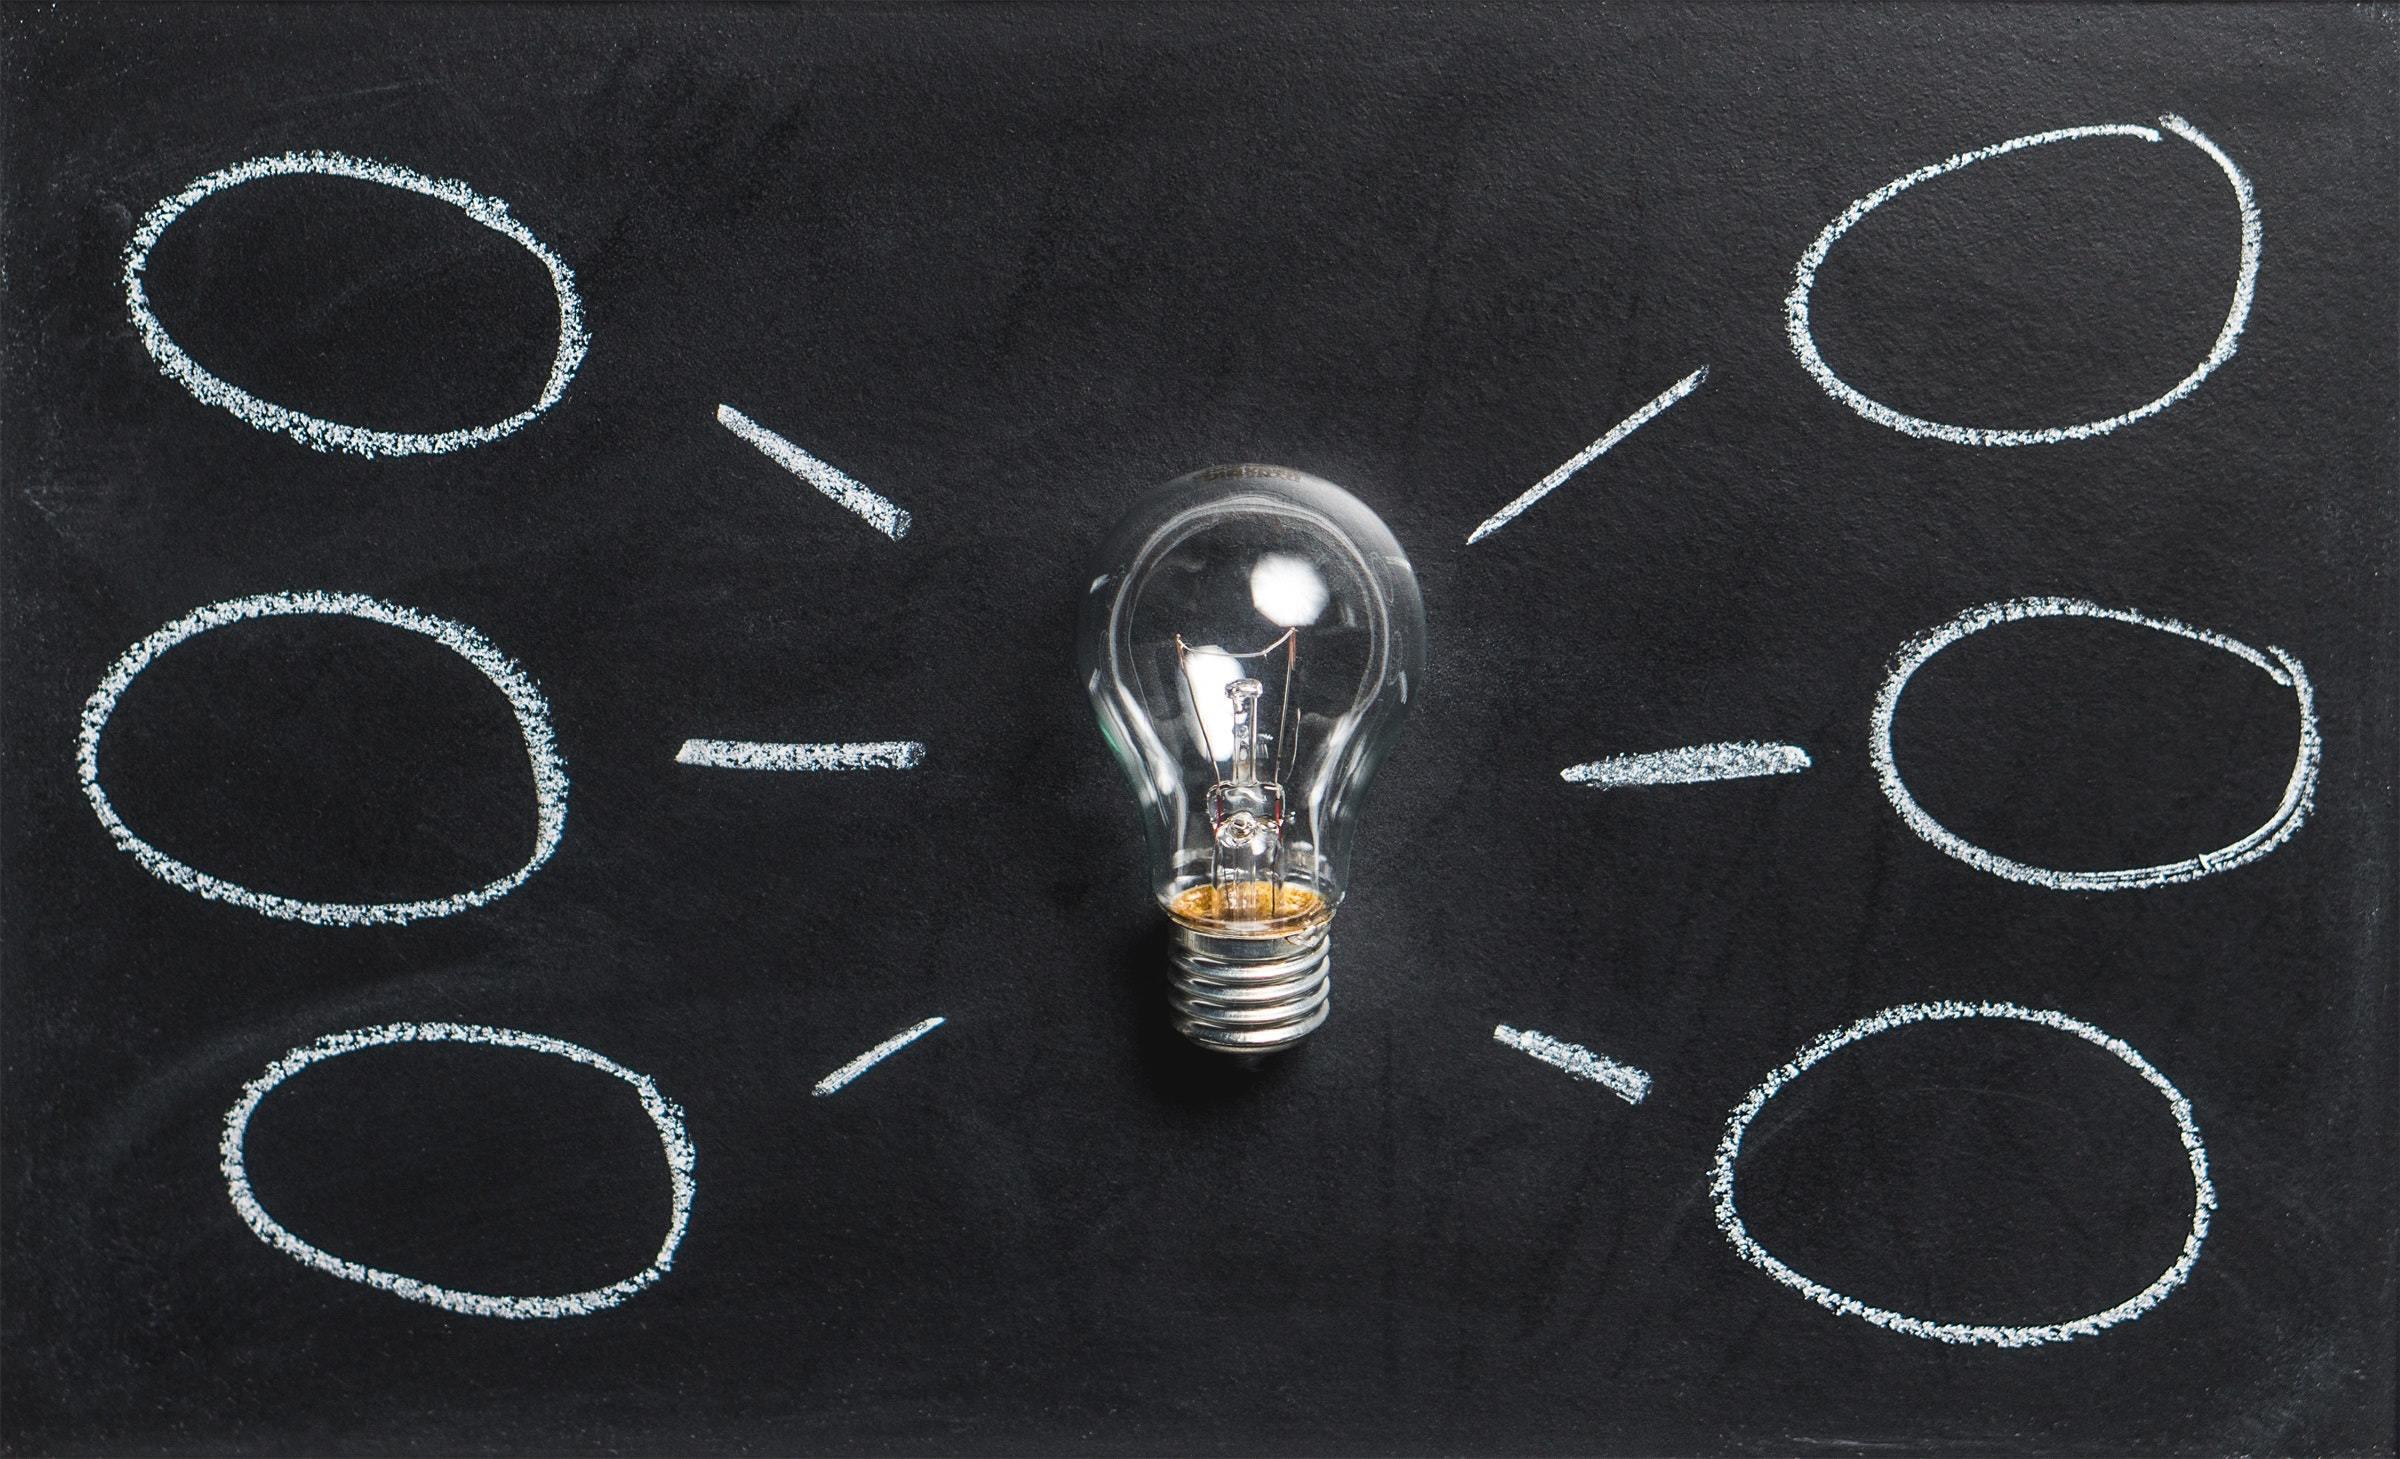 Transform your ITSM into an ESM